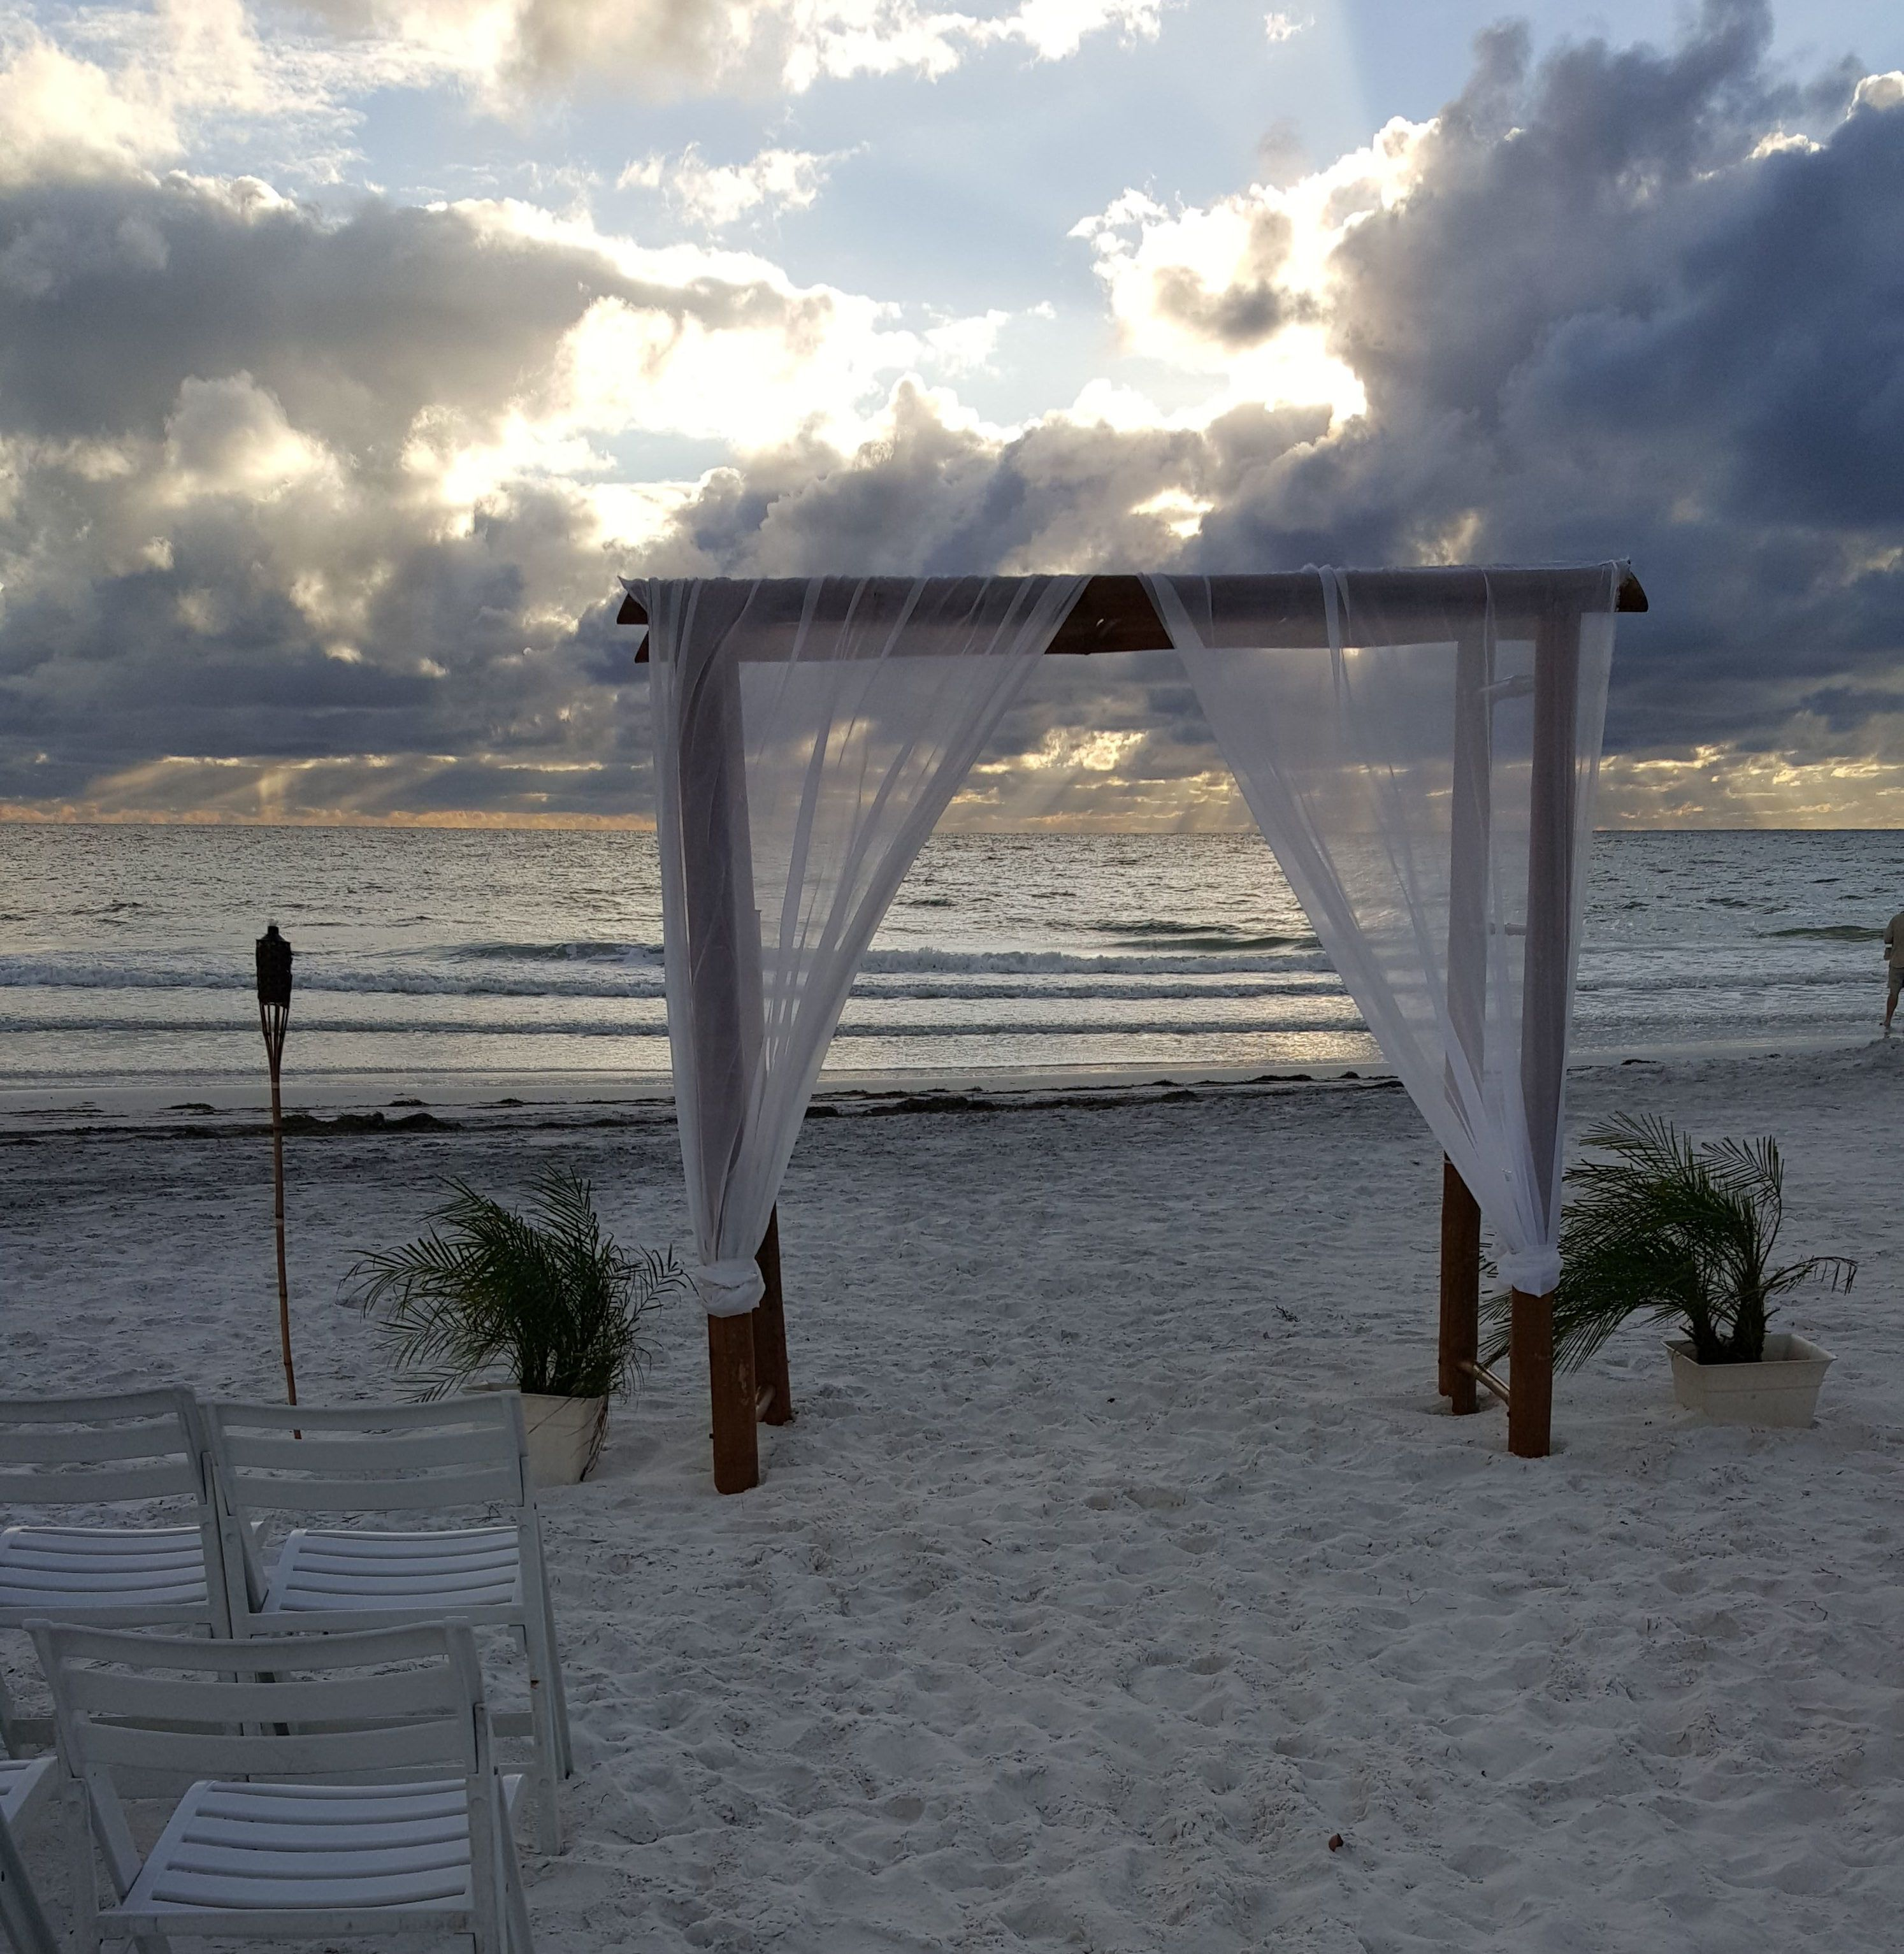 First Honeymoon Island wedding ceremony of the Fall